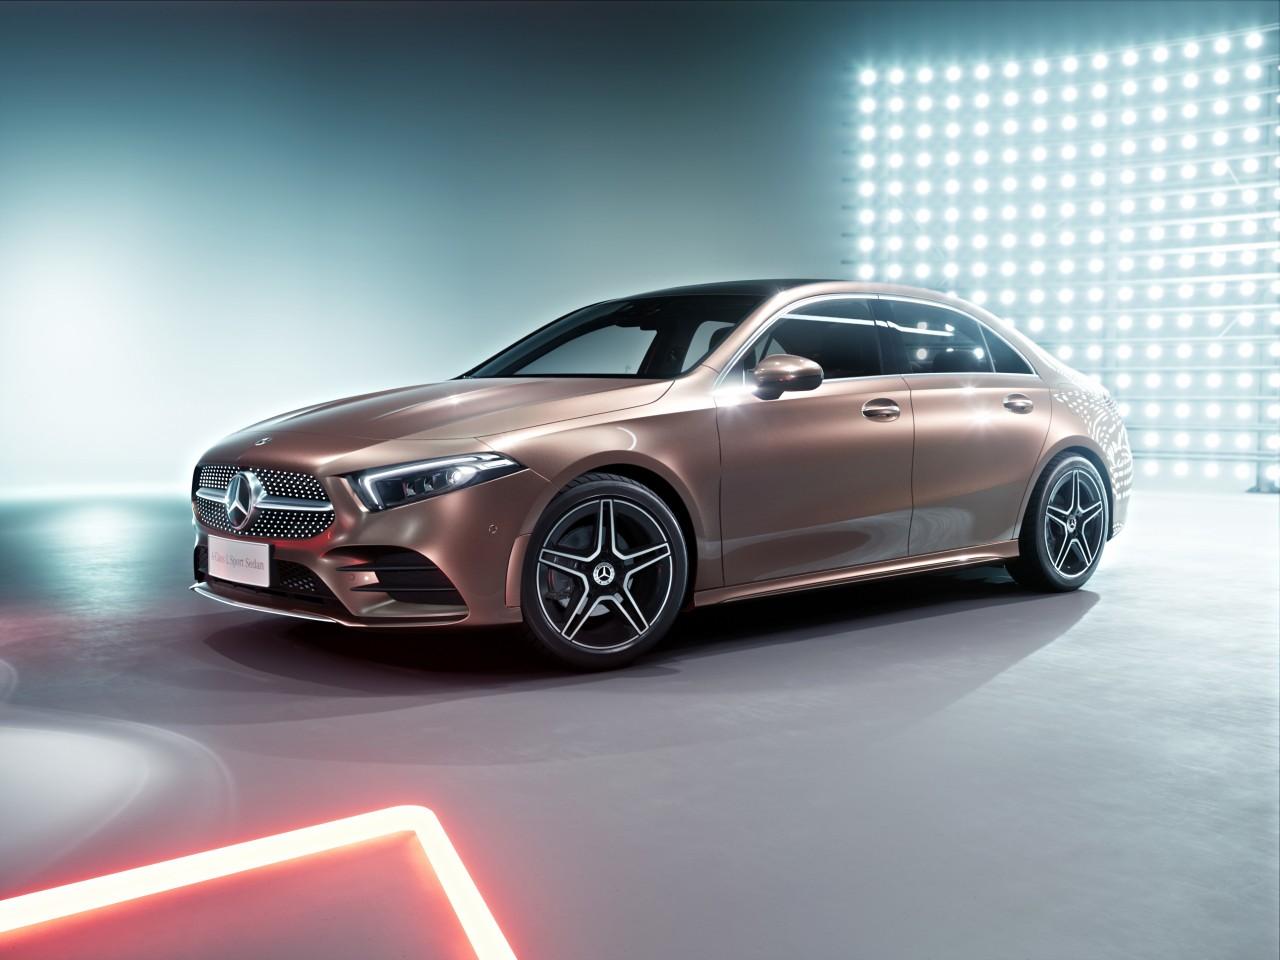 Neues Mitglied der Kompaktklasse-Familie: Weltpremiere der A-Klasse L Limousine